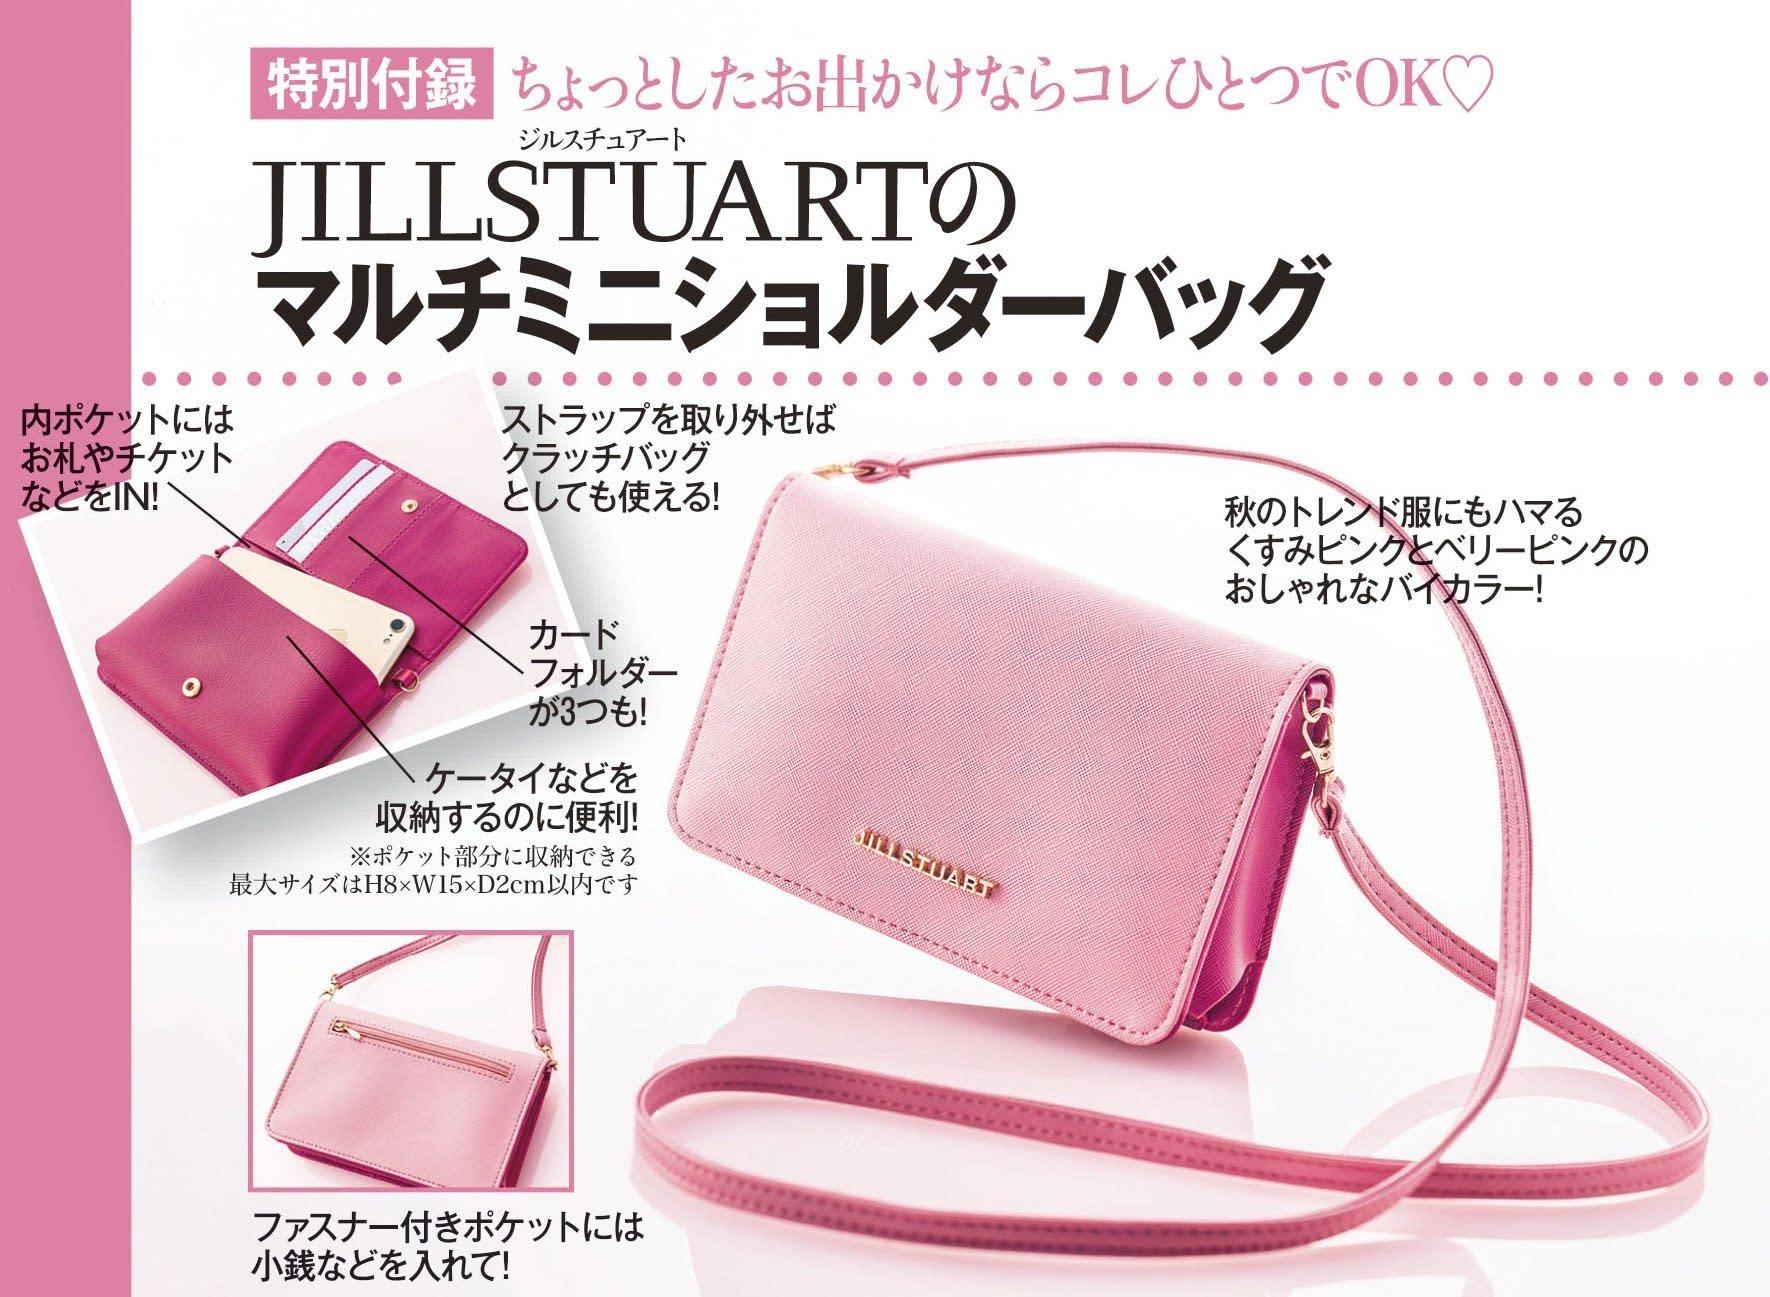 JILLSTUART粉紅小包